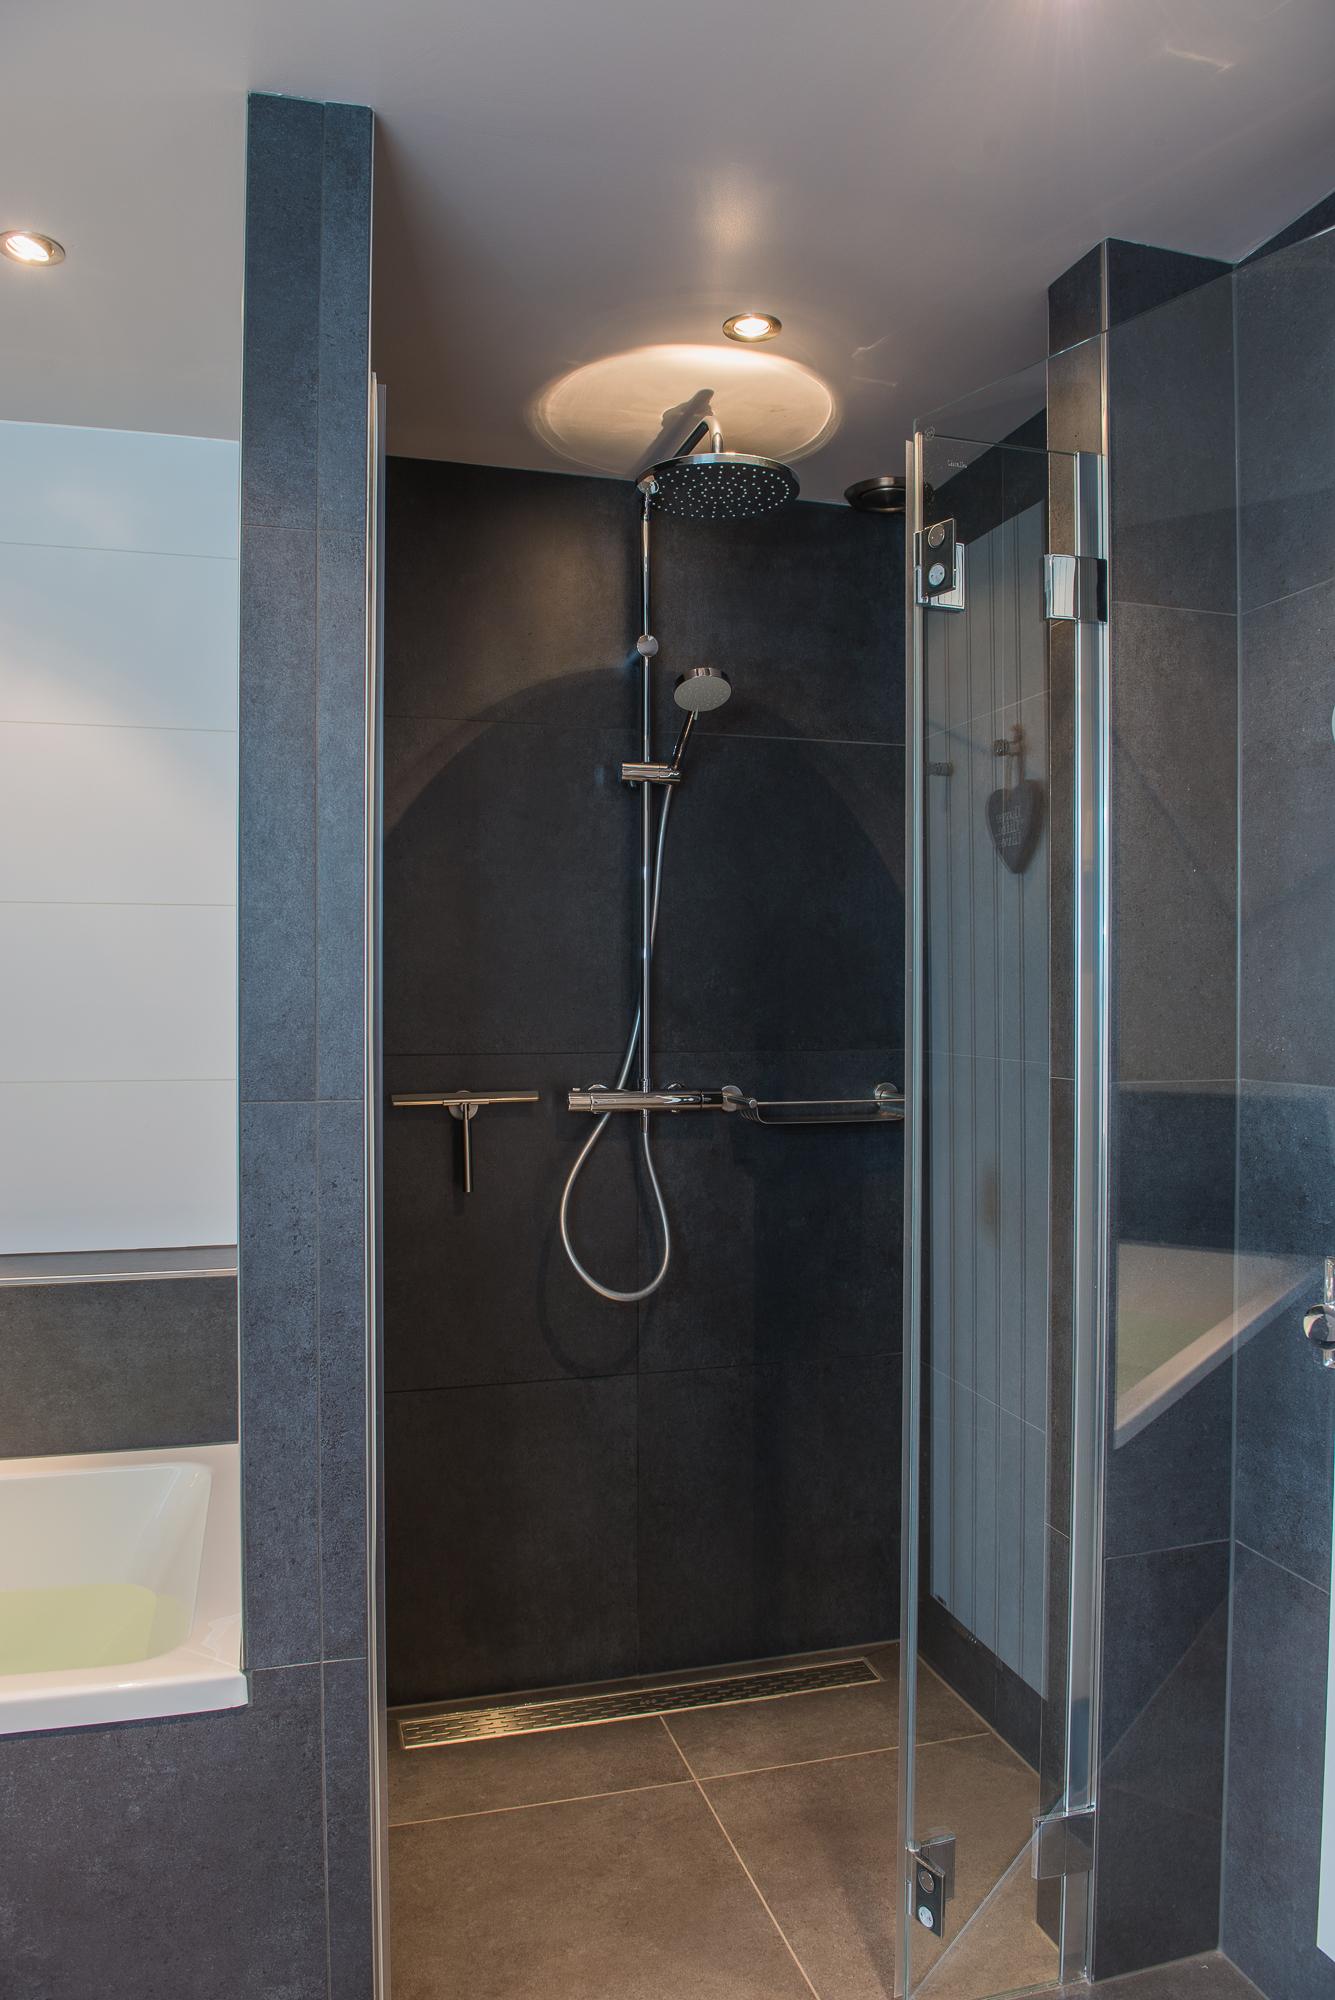 Badkamer sint nicolaasga 4 iksopar - Badkamer foto met douche ...